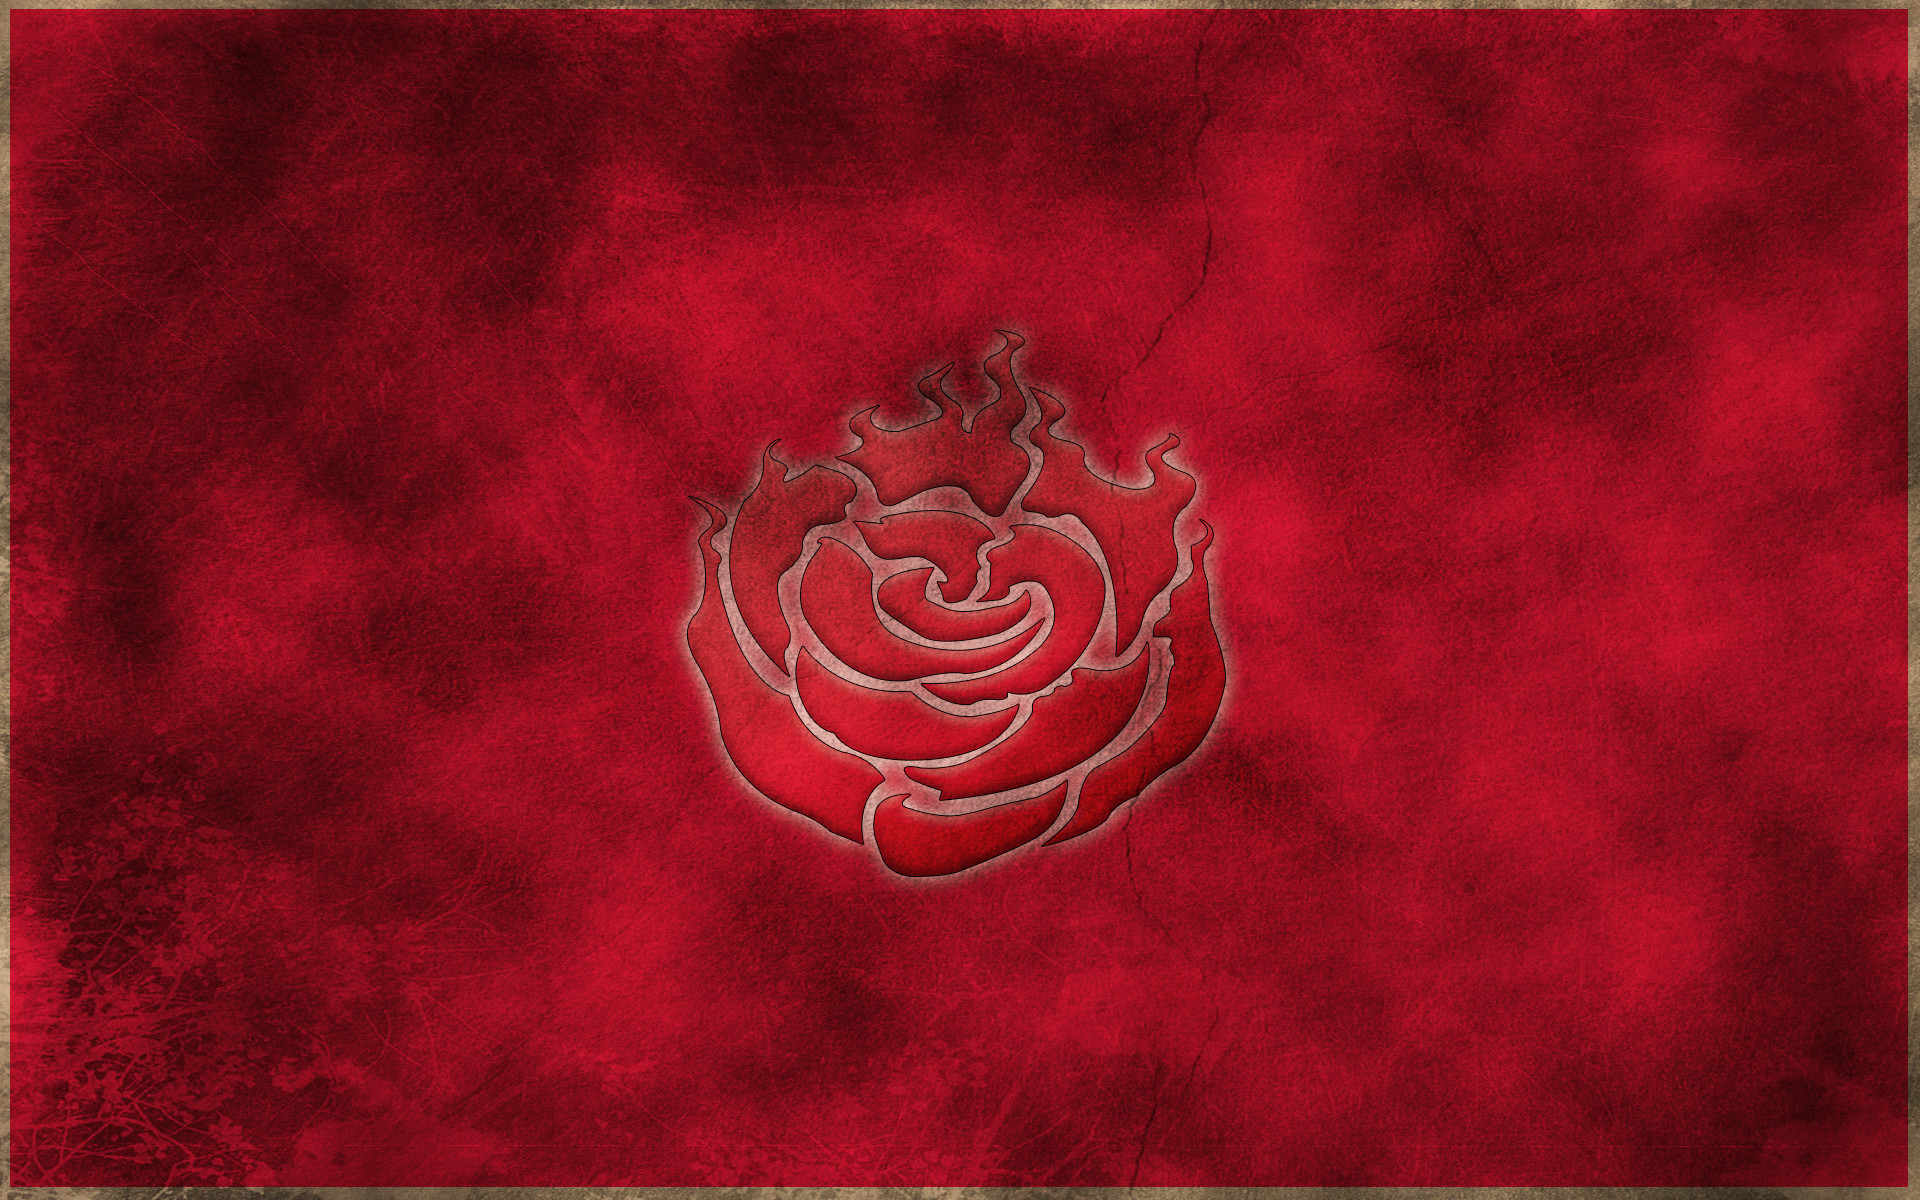 RWBY wallpapers emblem